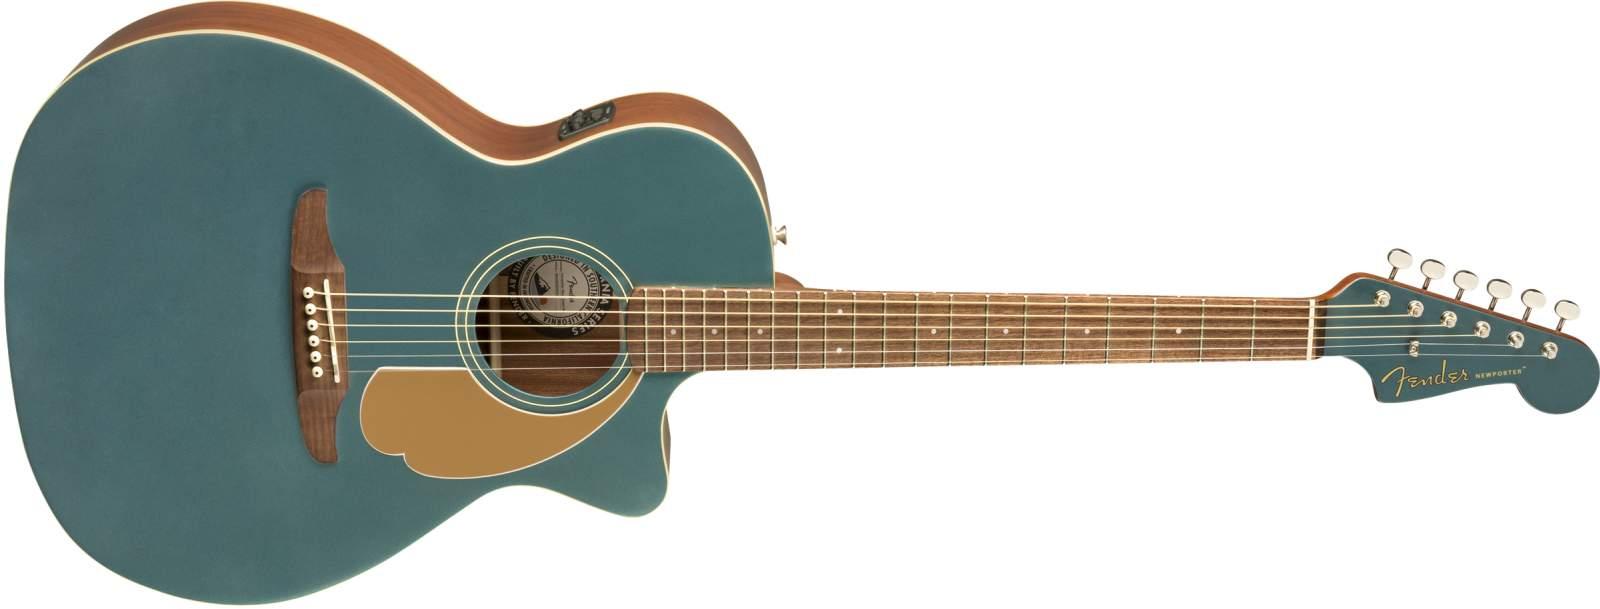 Fender Newporter Player Ocean Teal